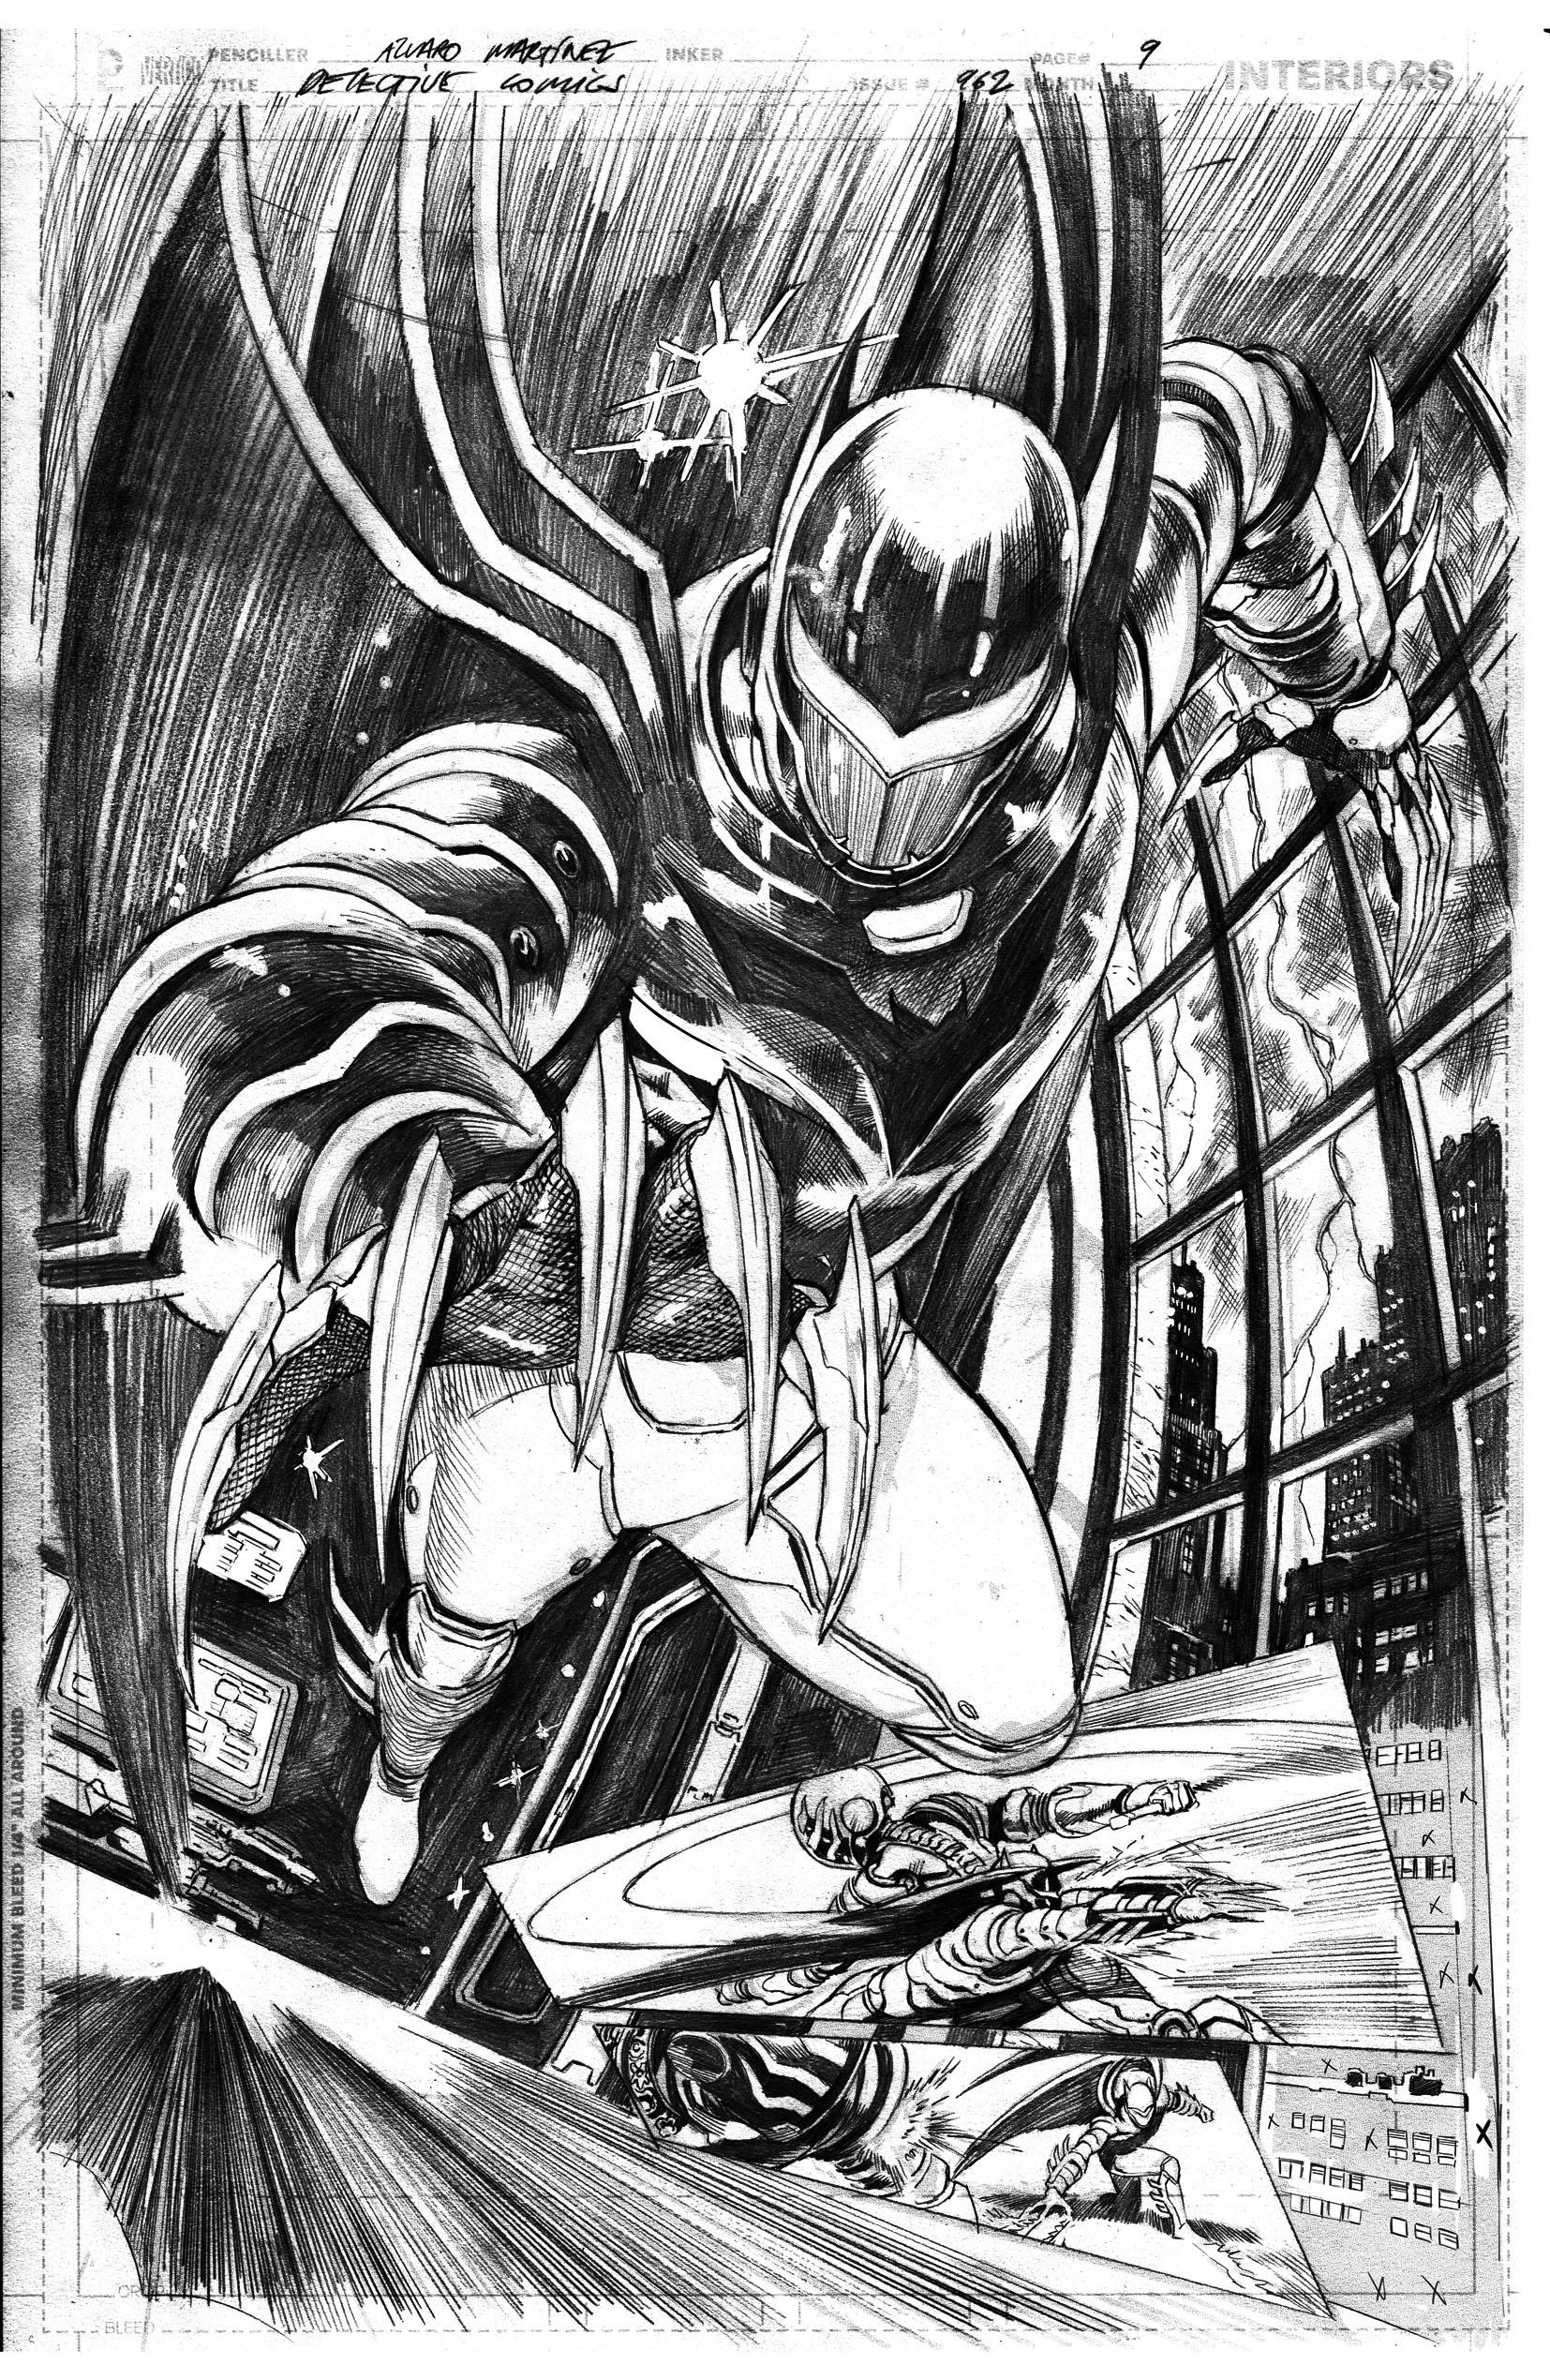 Detective Comics #962 page 9